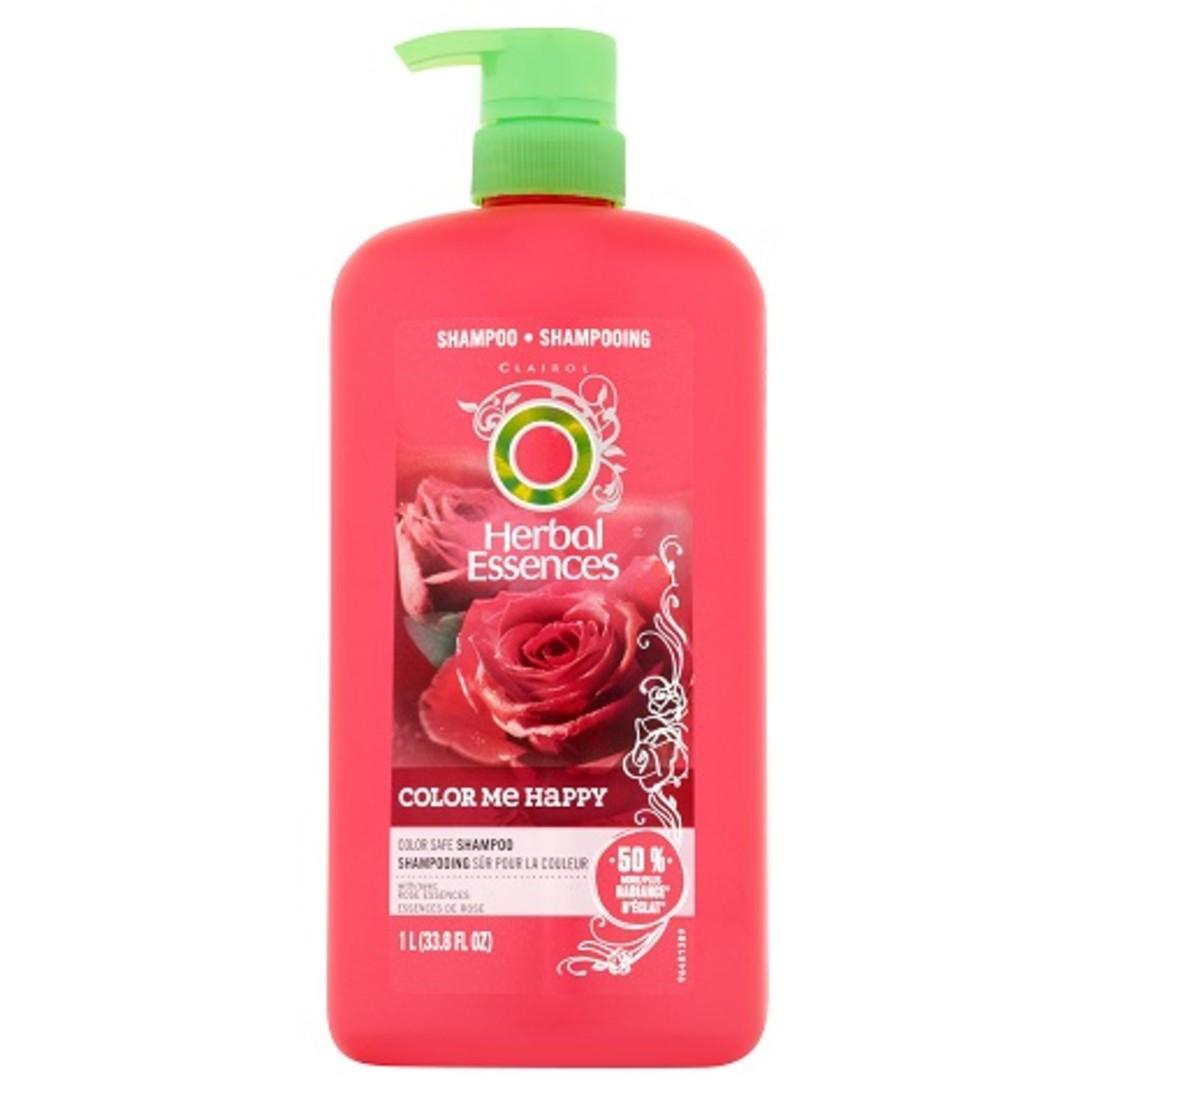 Herbal Essence Color Me Happy Shampoo